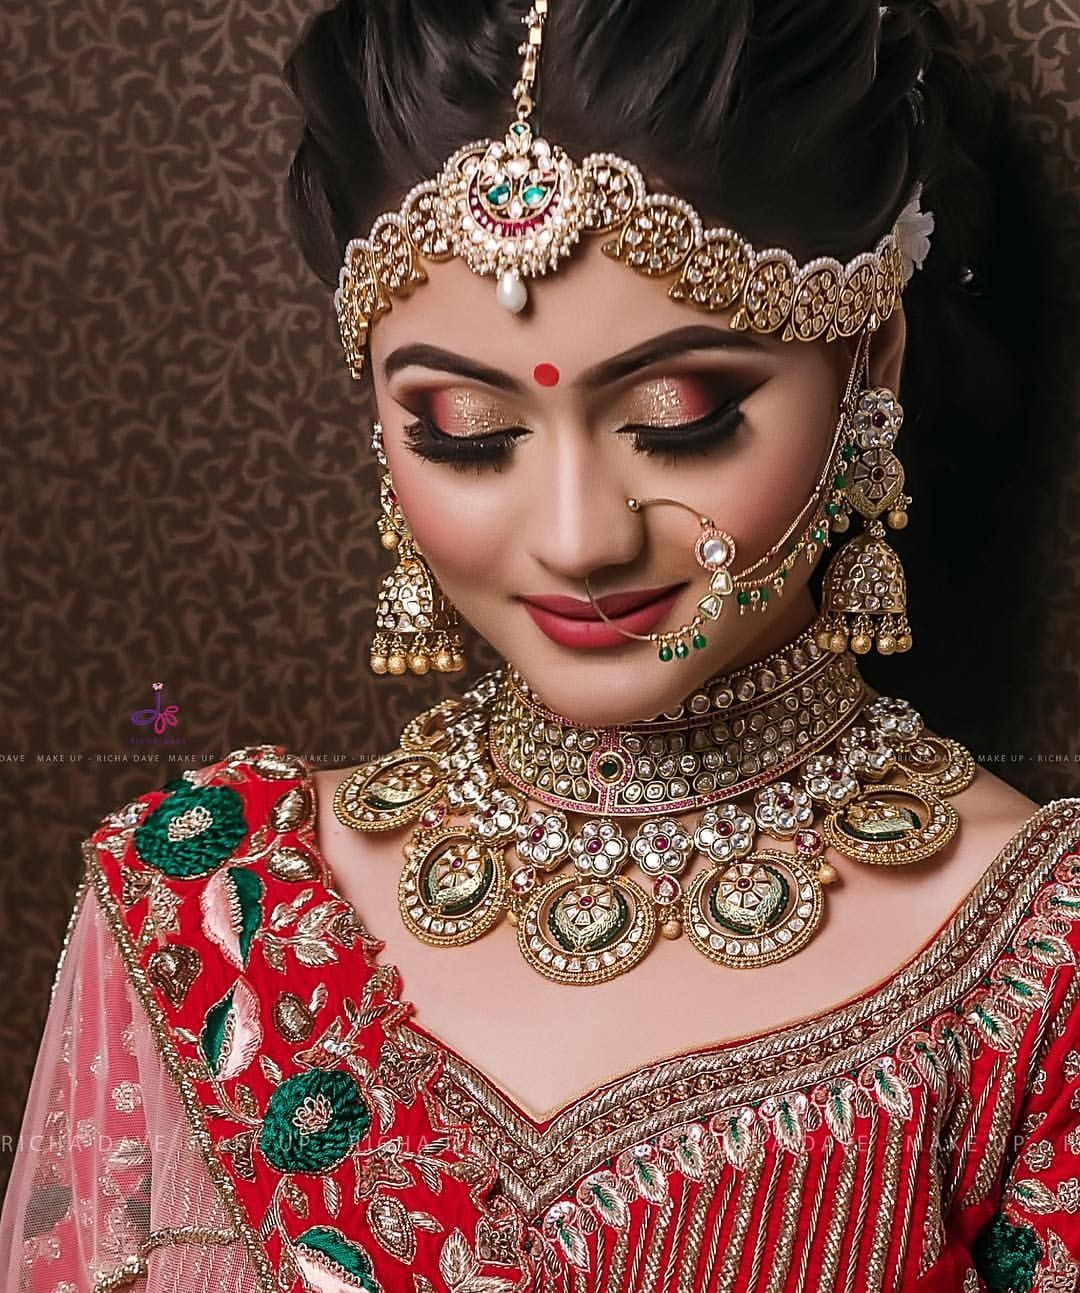 shikachand | indian bridal makeup, bridal eye makeup, bridal